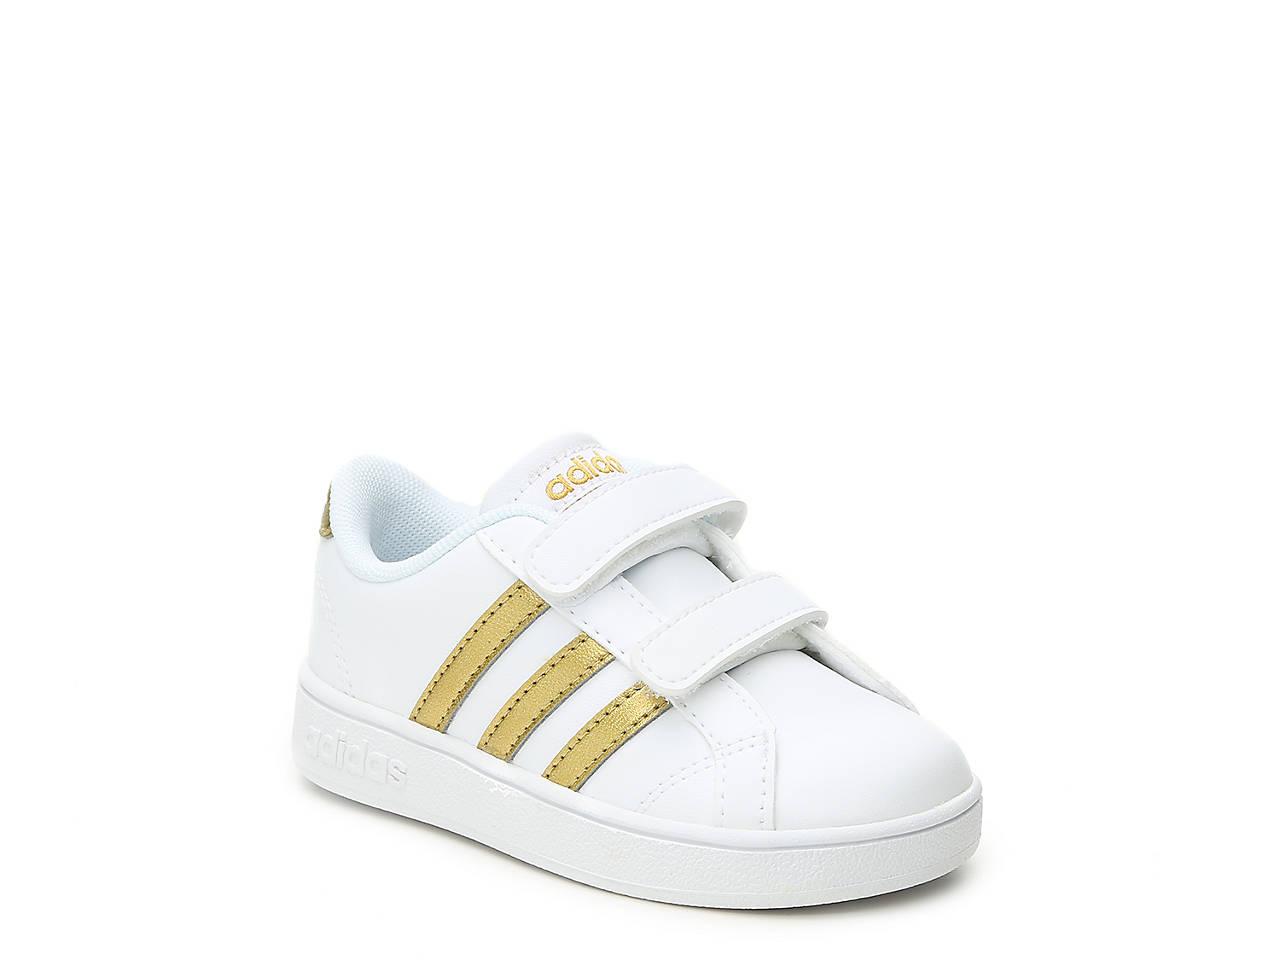 6f4b5742f adidas Baseline Infant   Toddler Sneaker Kids Shoes